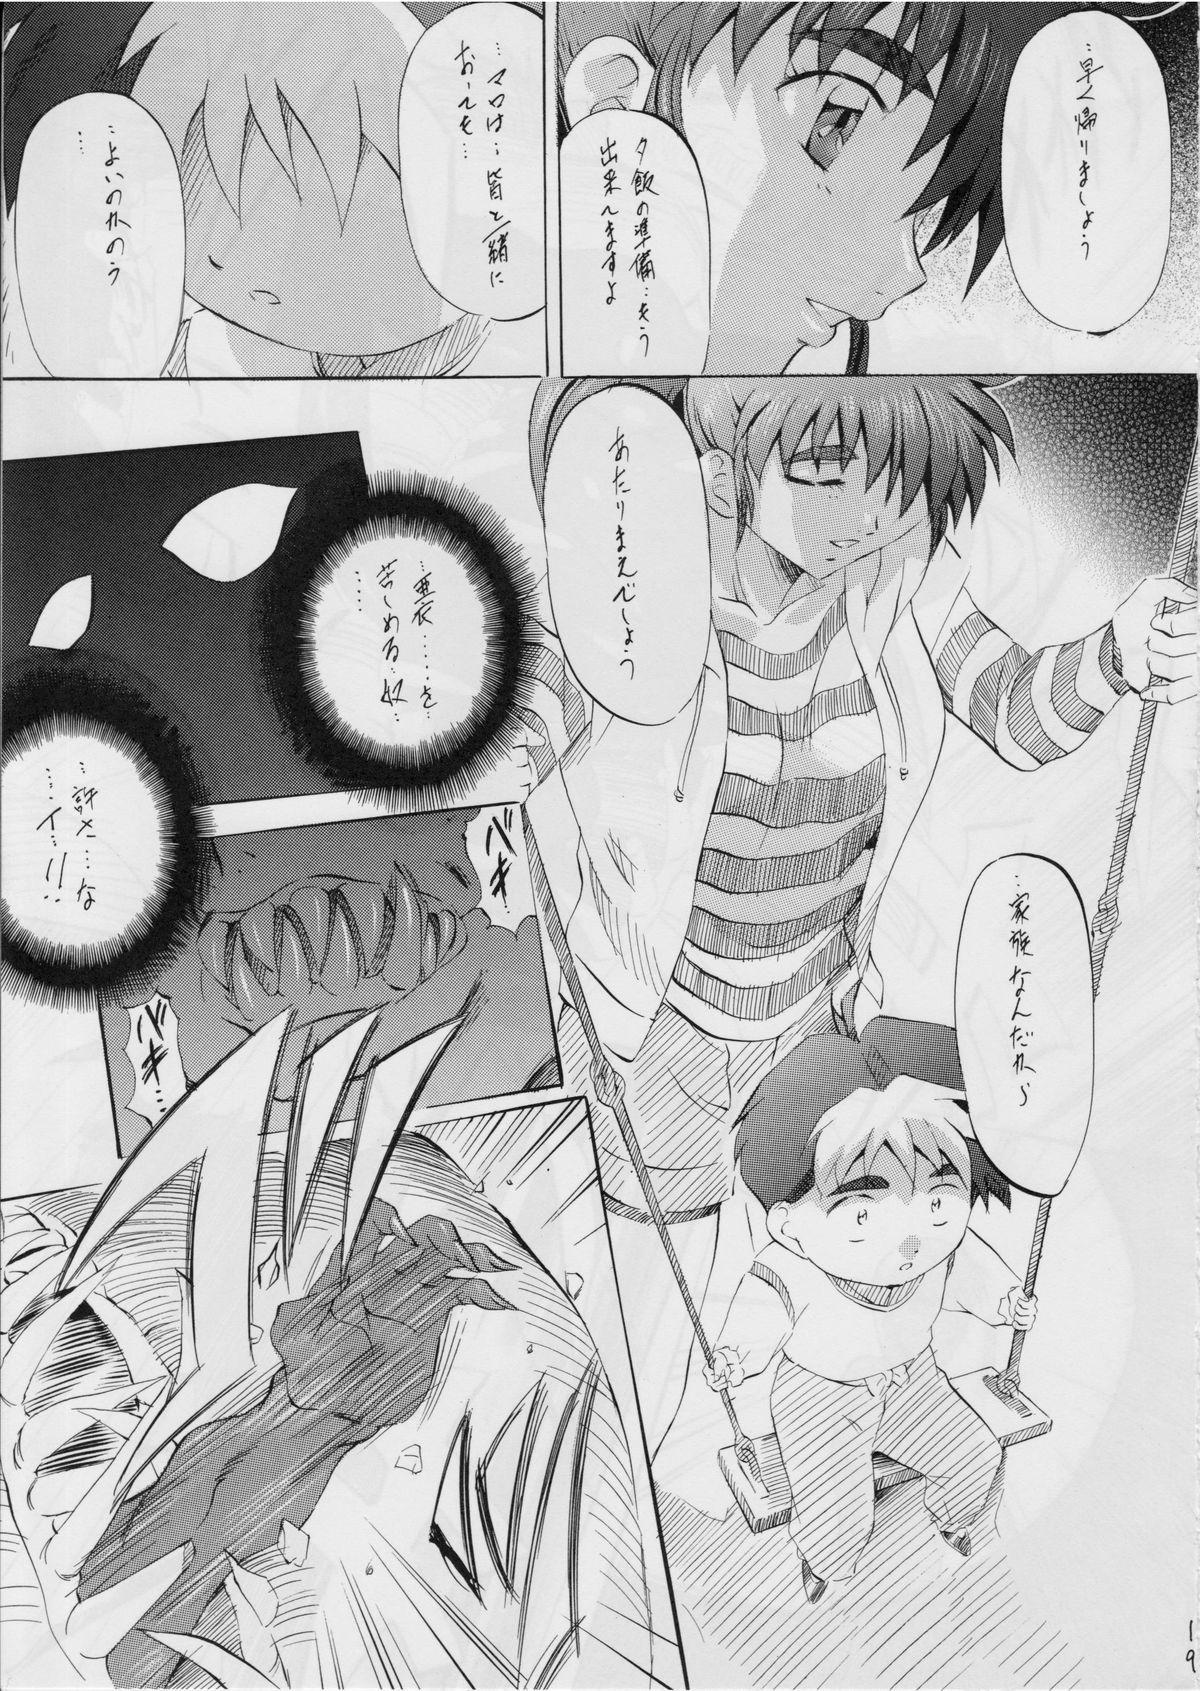 [Busou Megami (Kannaduki Kanna)] Ai & Mai Gaiden -Aoki Seido-Kouhen- (Inju Seisen Twin Angels) 18